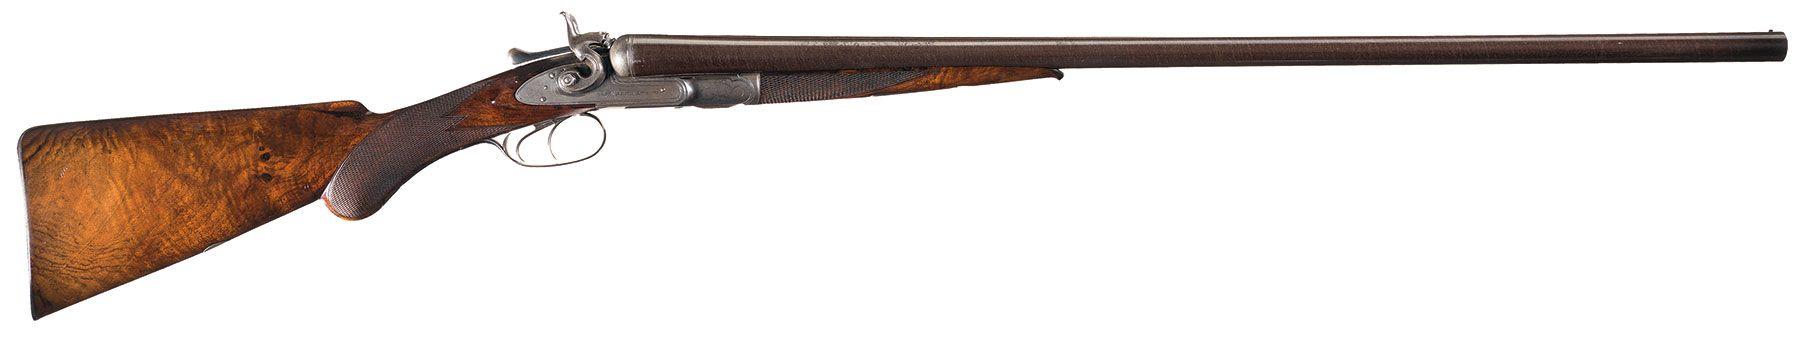 Colt 1878